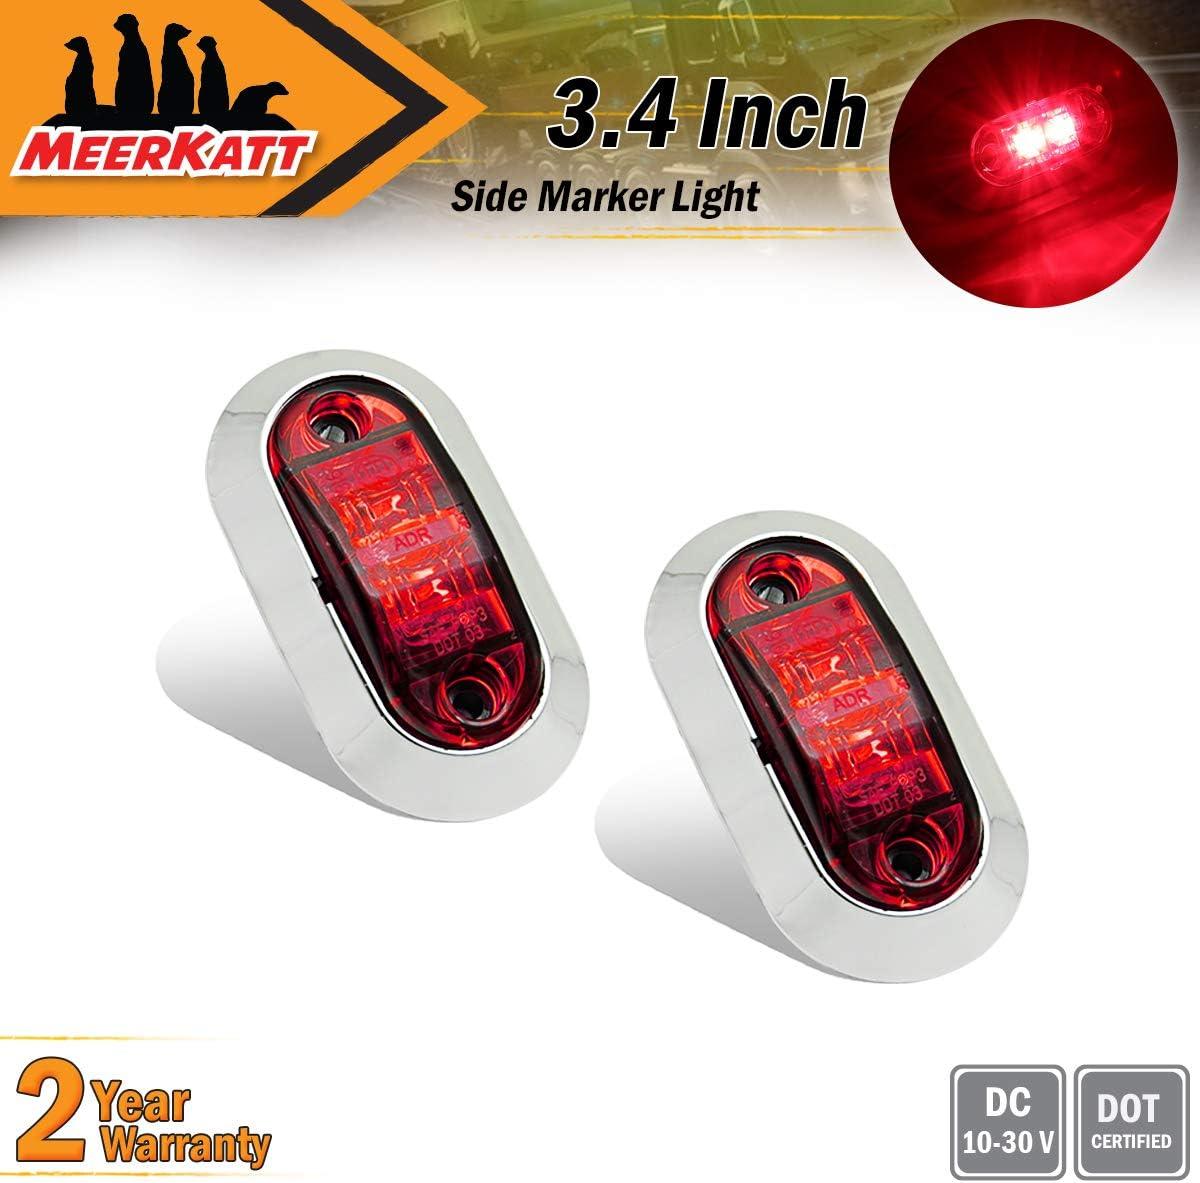 Meerkatt Pack of 4 4 Inch Oblong Red Rectangle Clearance Lamp Sealed Indicator Bulb Multi-Function LED Side Marker Lights 6 Diodes Shockproof Trailer Lorry Truck Van Cars Bus Cabin 12v DC TT12